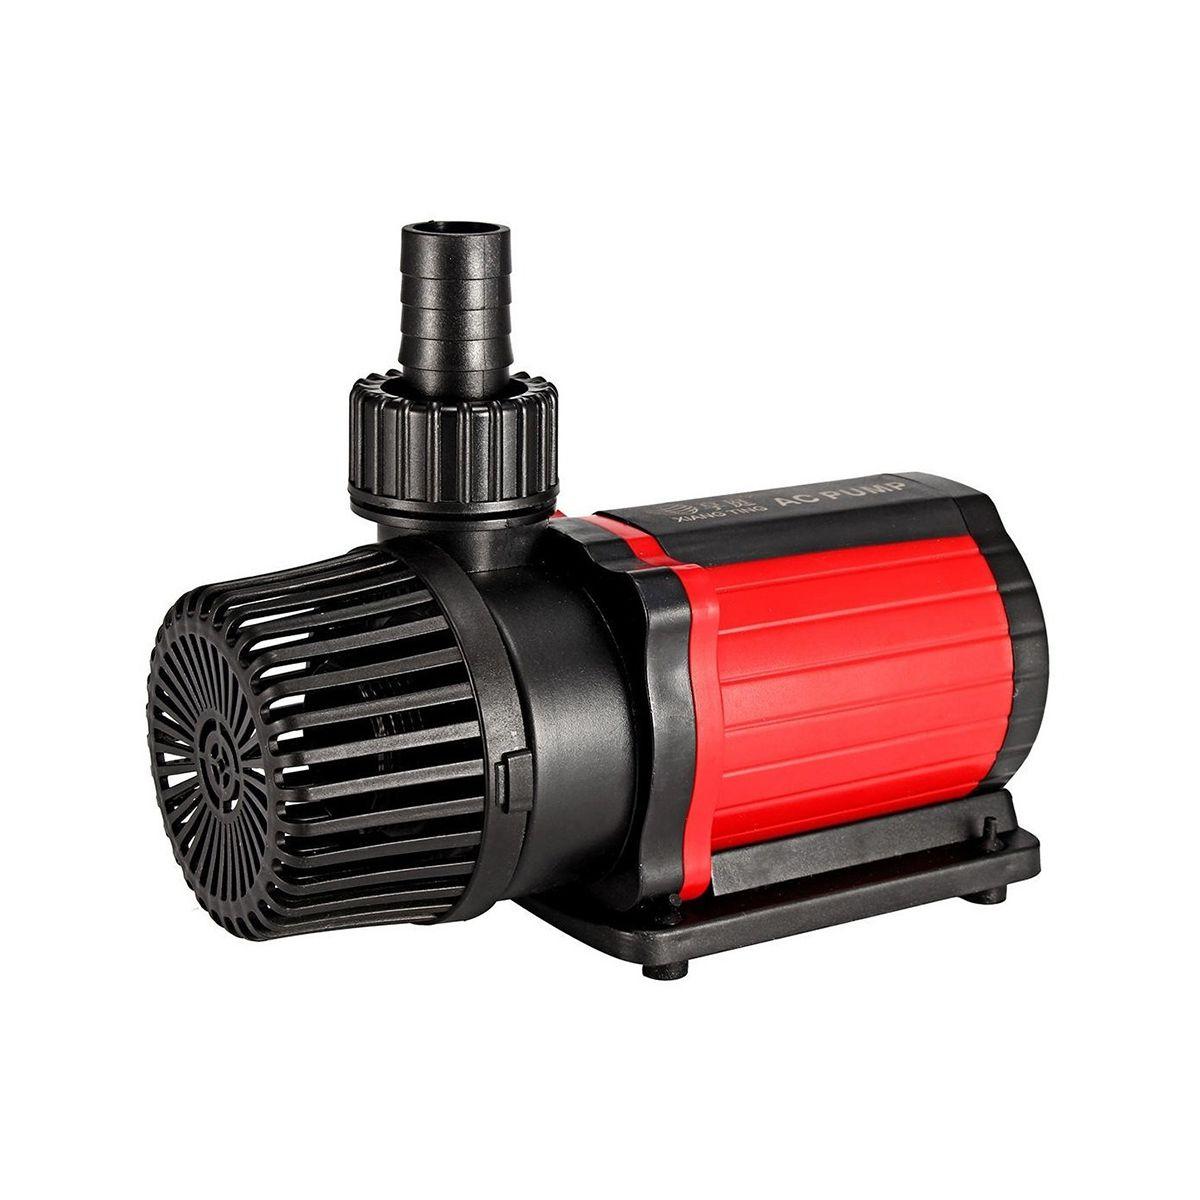 Bomba Ocean Tech 12000l/h Ac-12000 220v Eletrônica Econômica